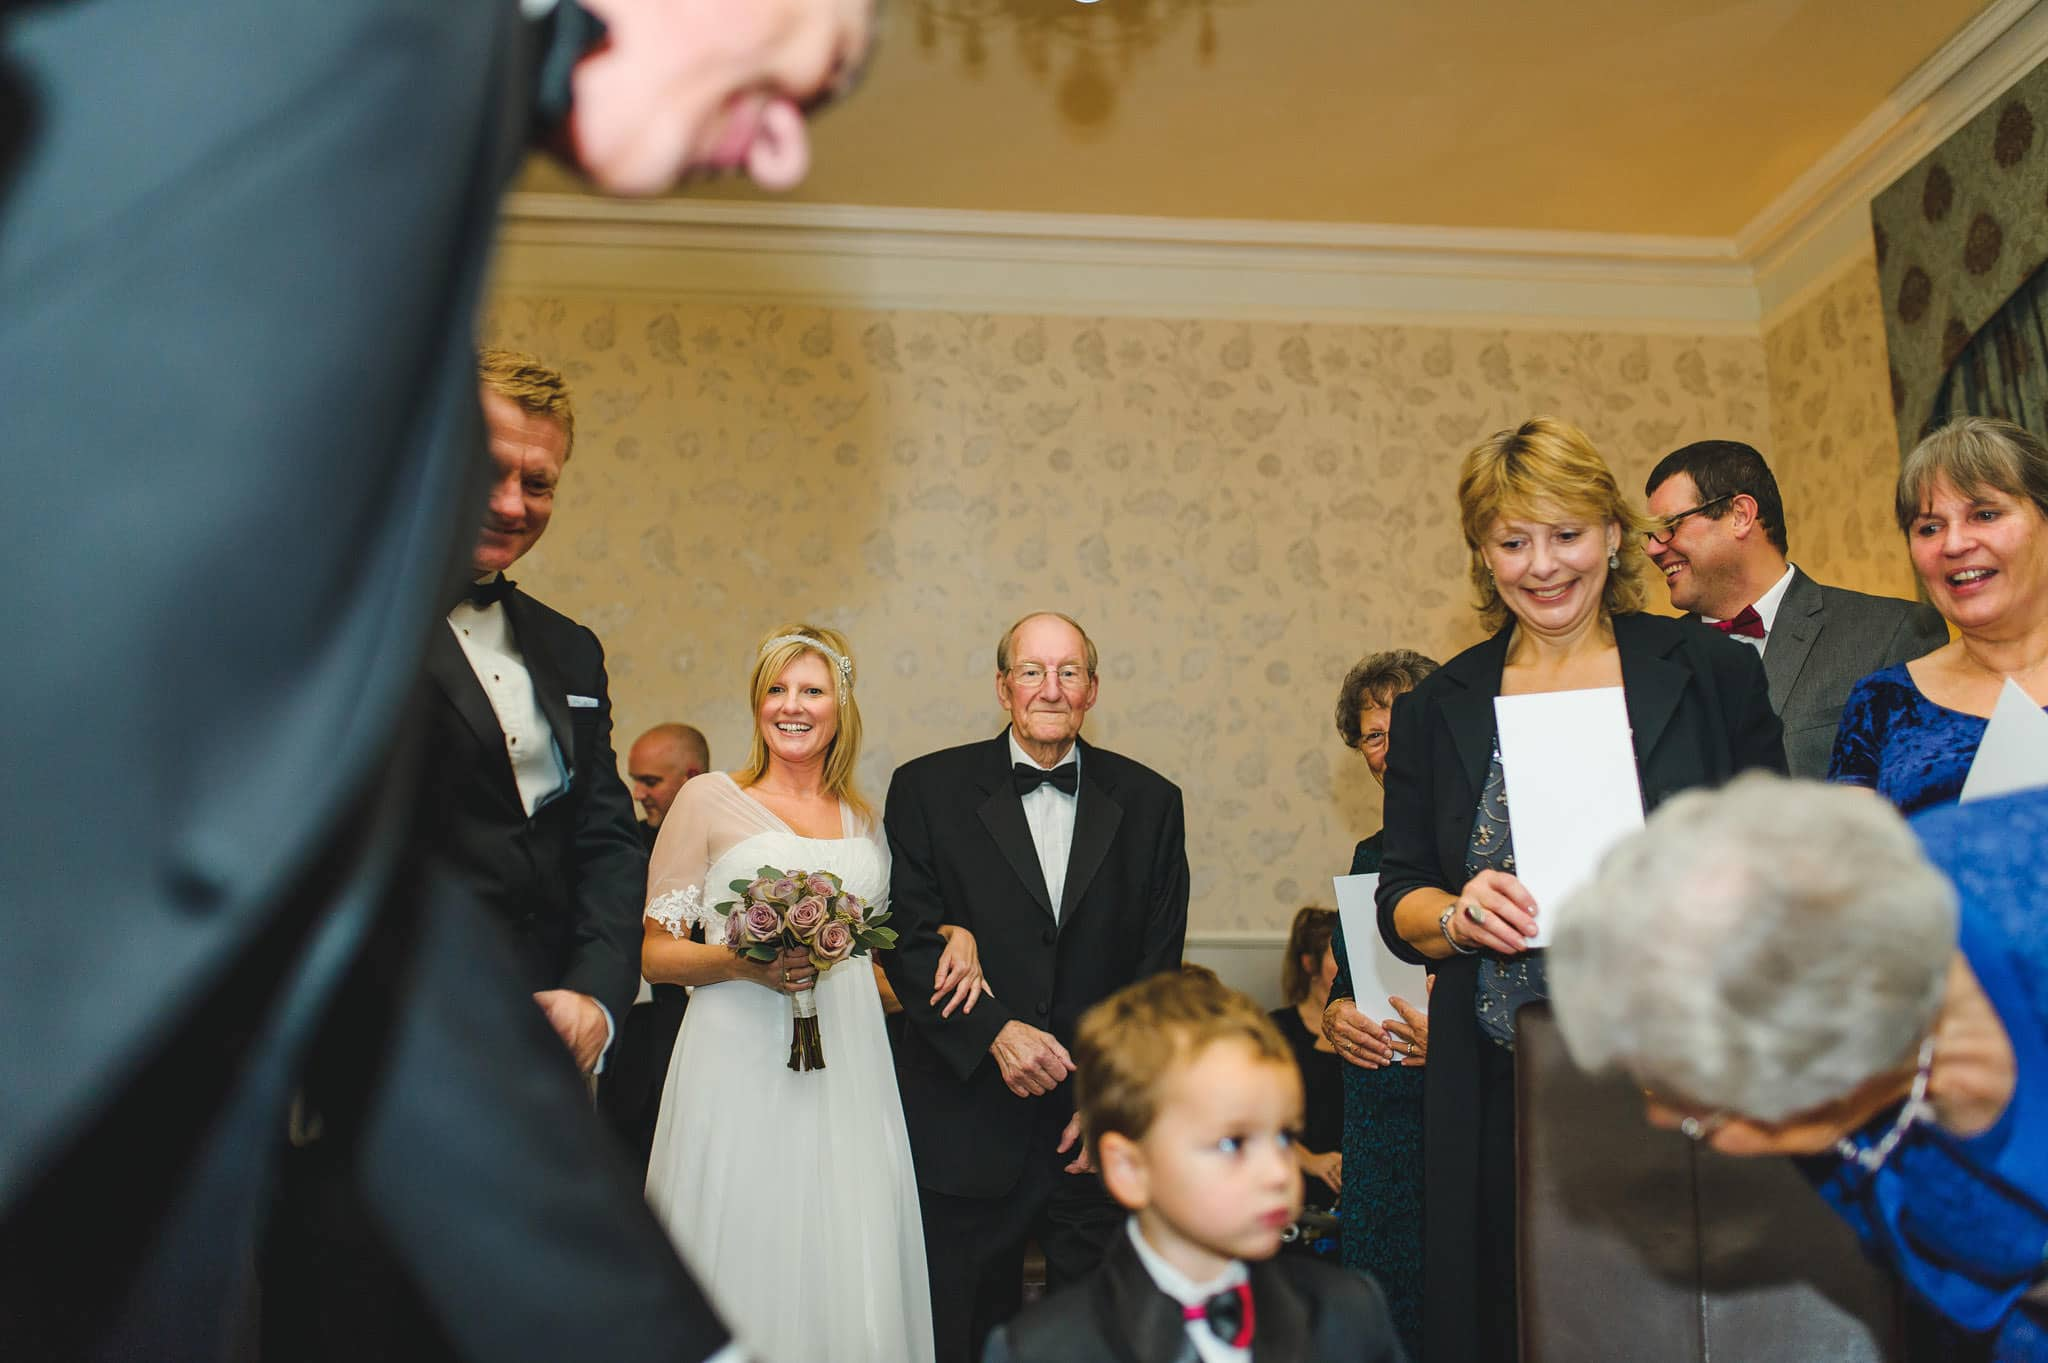 Wedding photography West Midlands | Claire + Stephen 26